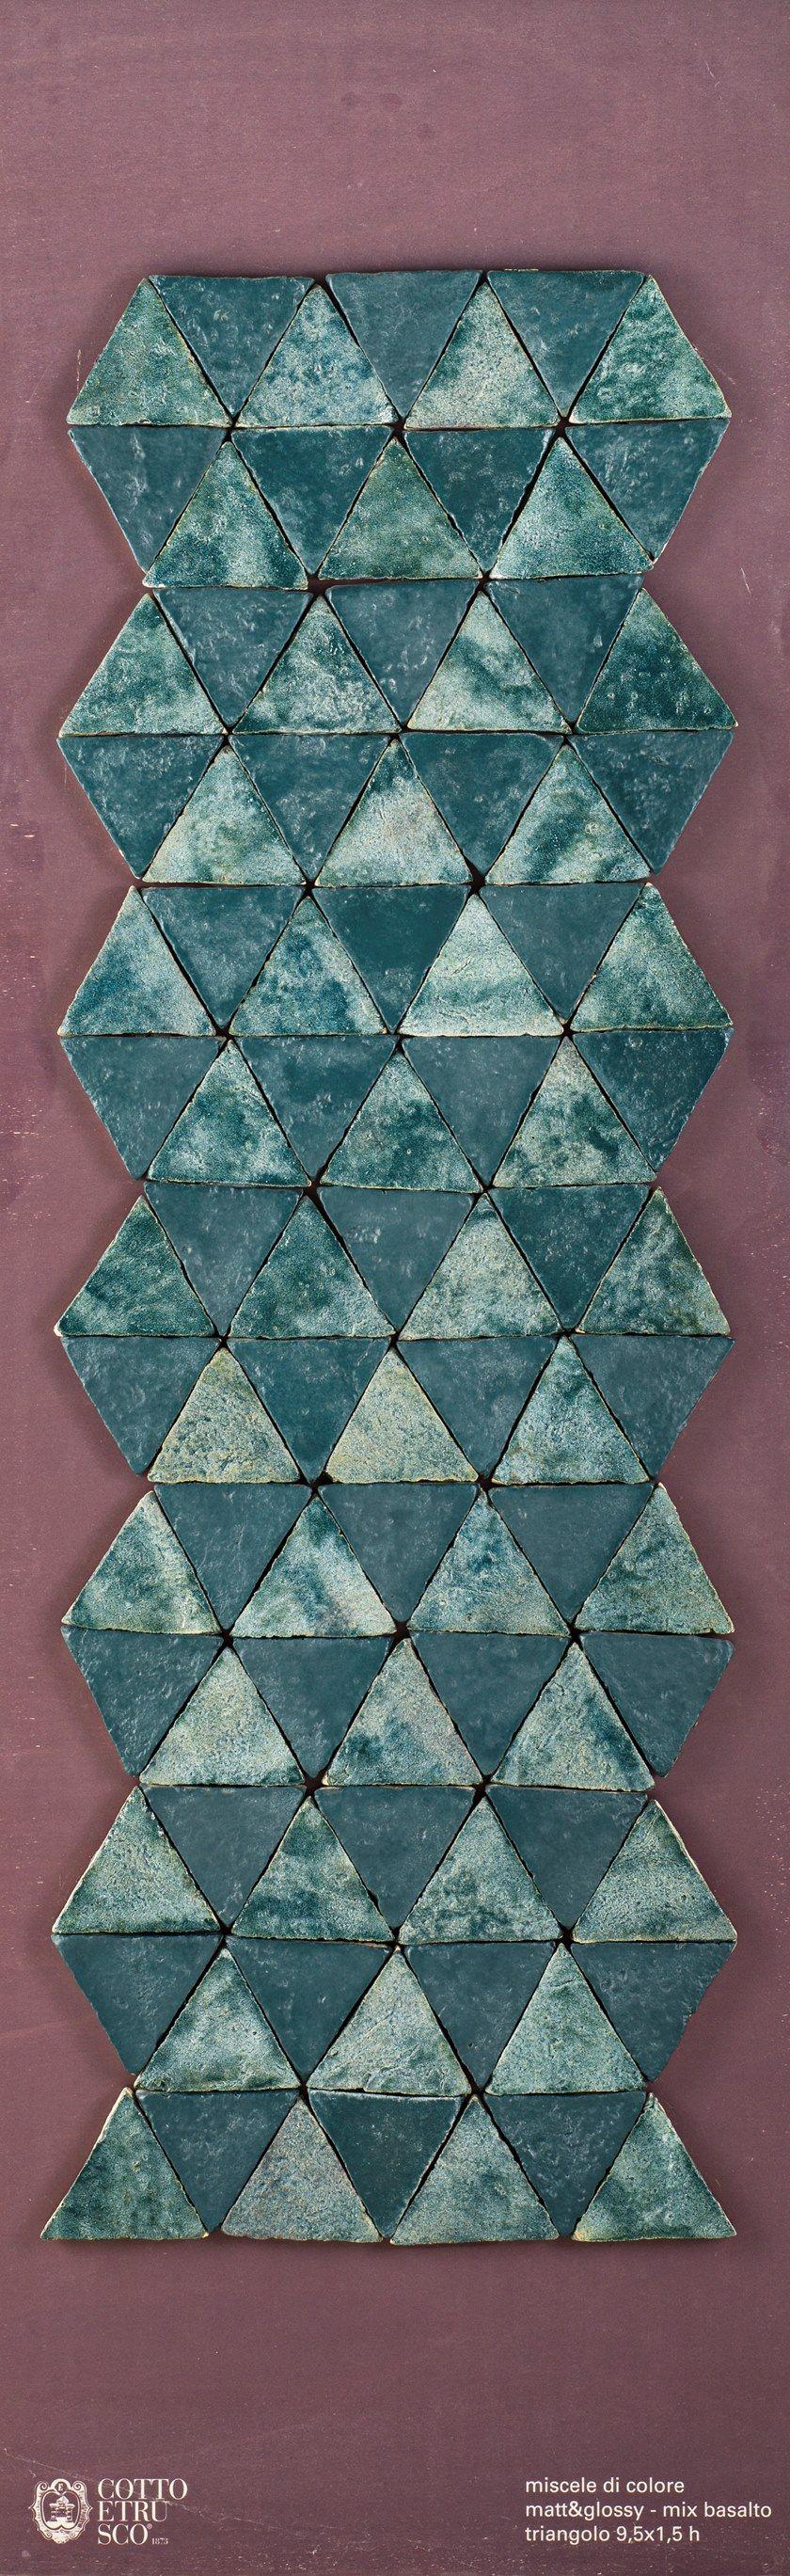 SMALTI - MATT & GLOSSY Triangolo L9.5 - Matt&Glossy - Basalto